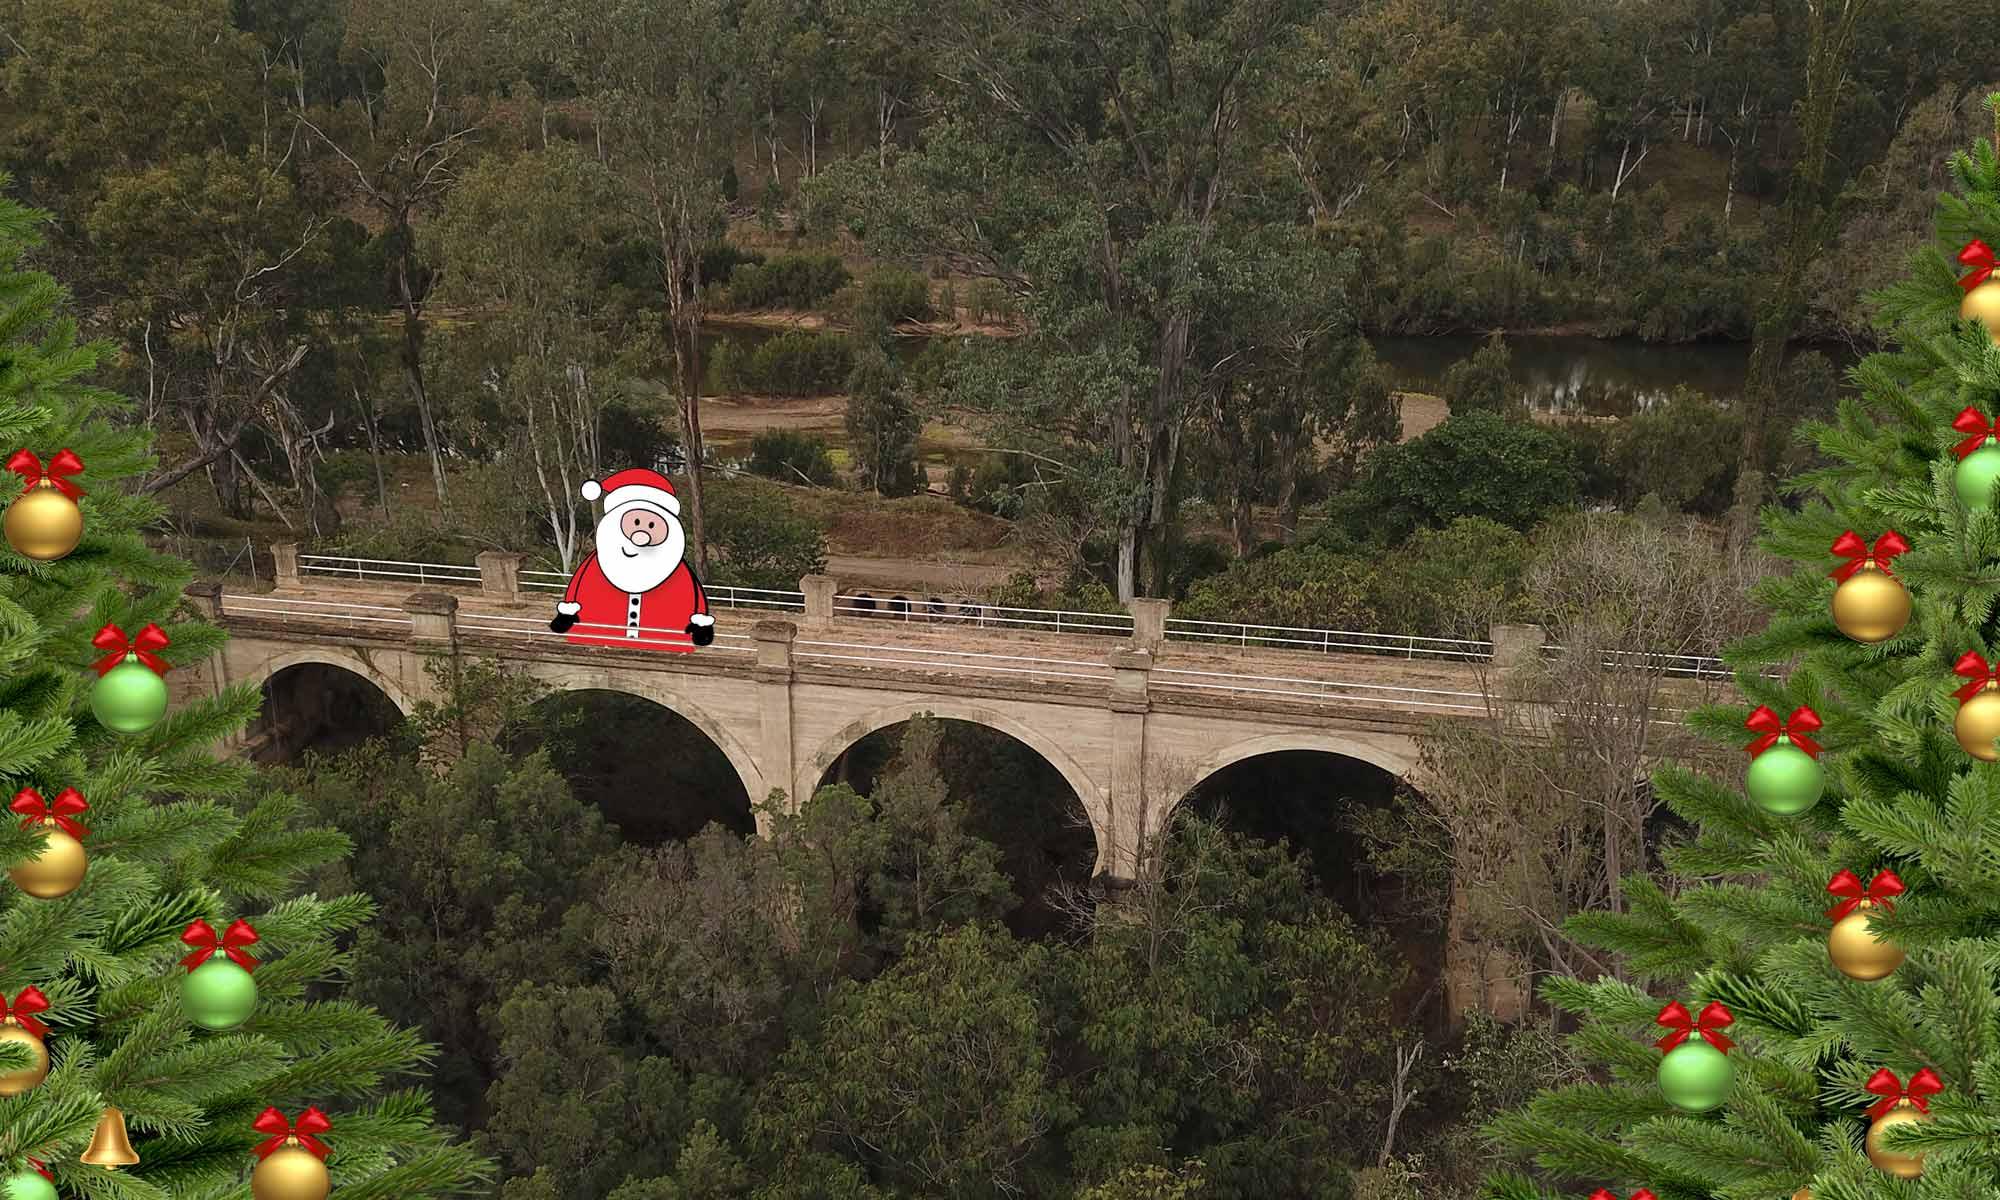 concrete arch bridge with santa and xmas trees